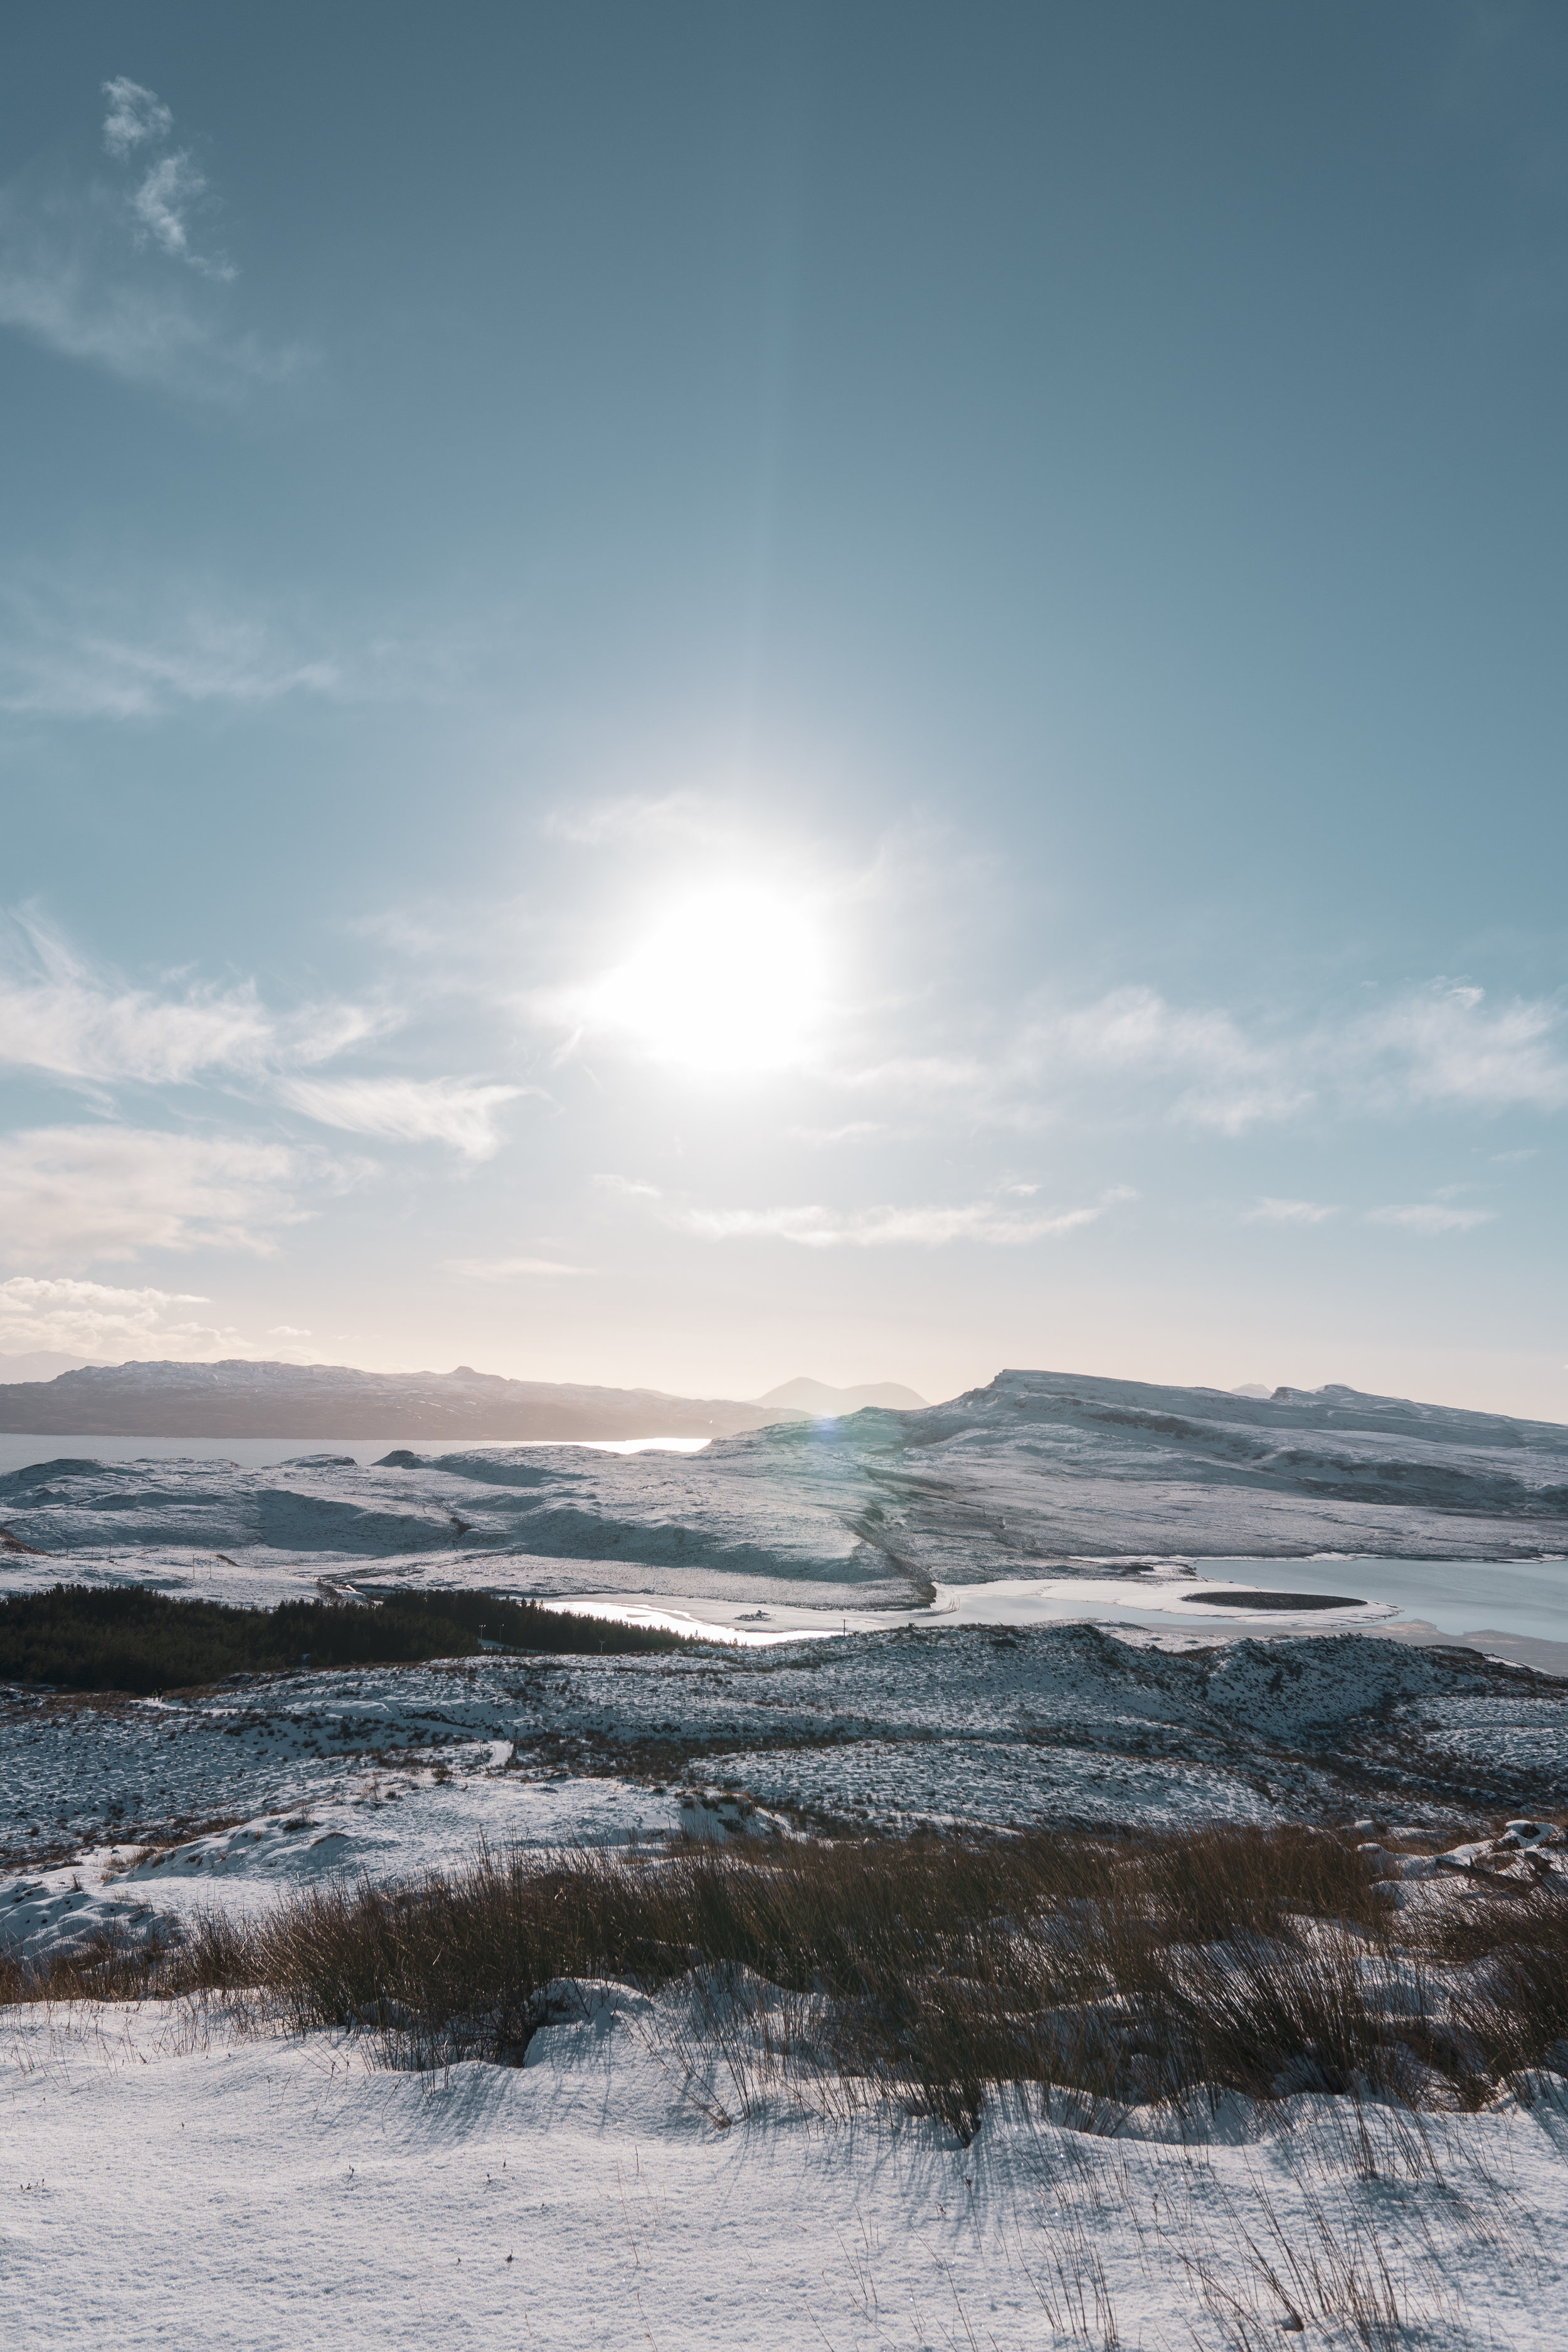 Isle-of-Skye-Winter-2019-Trotternish (25).jpg